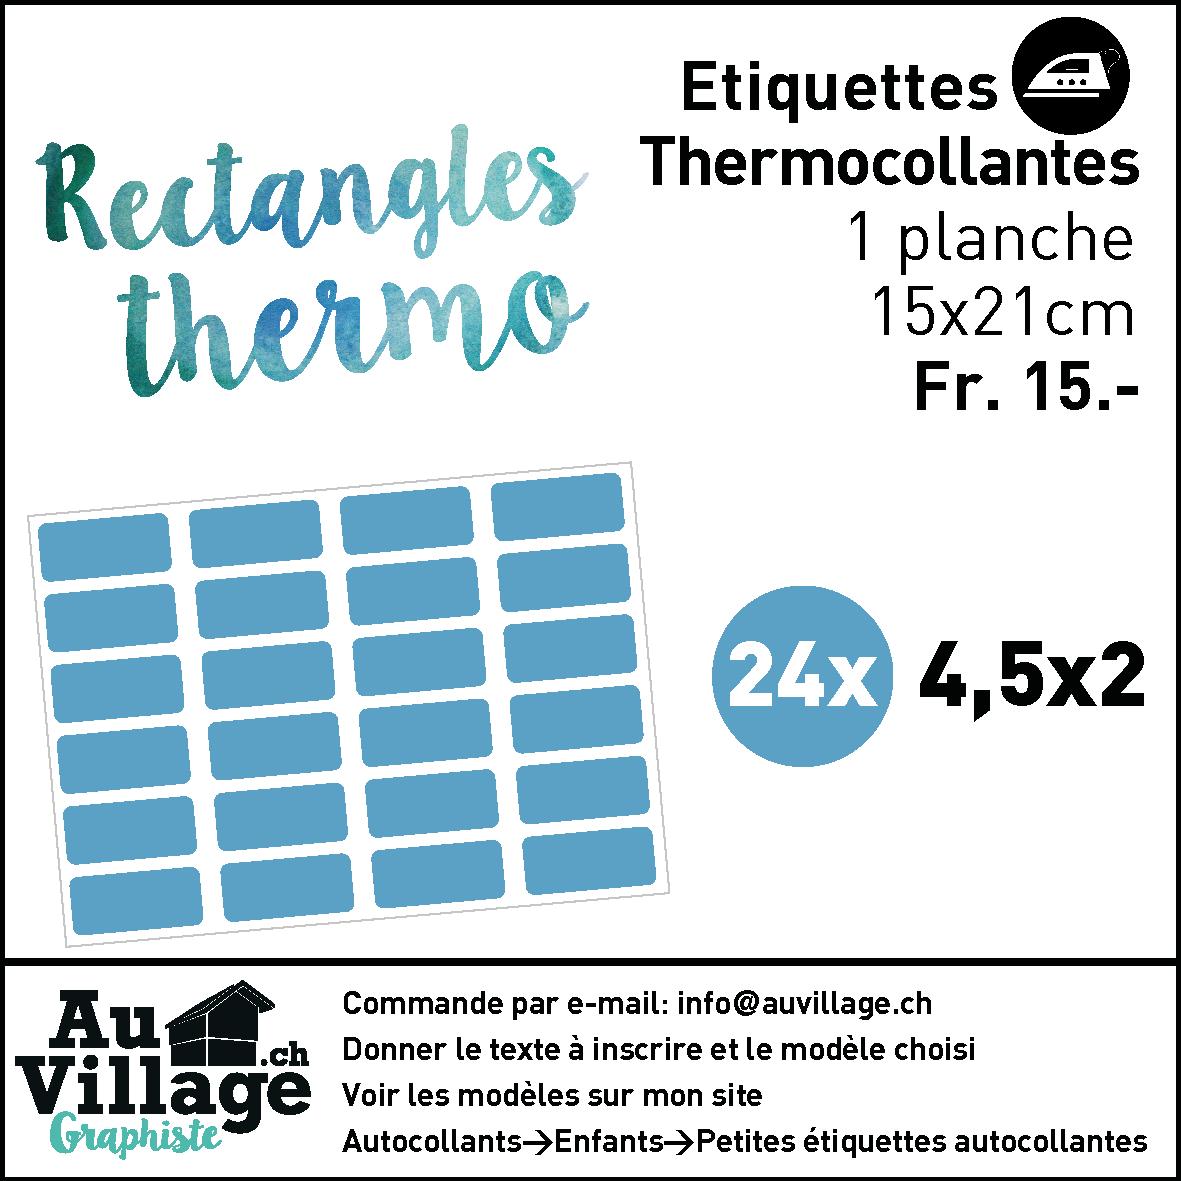 Etiquettes_vinyle&thermo-06